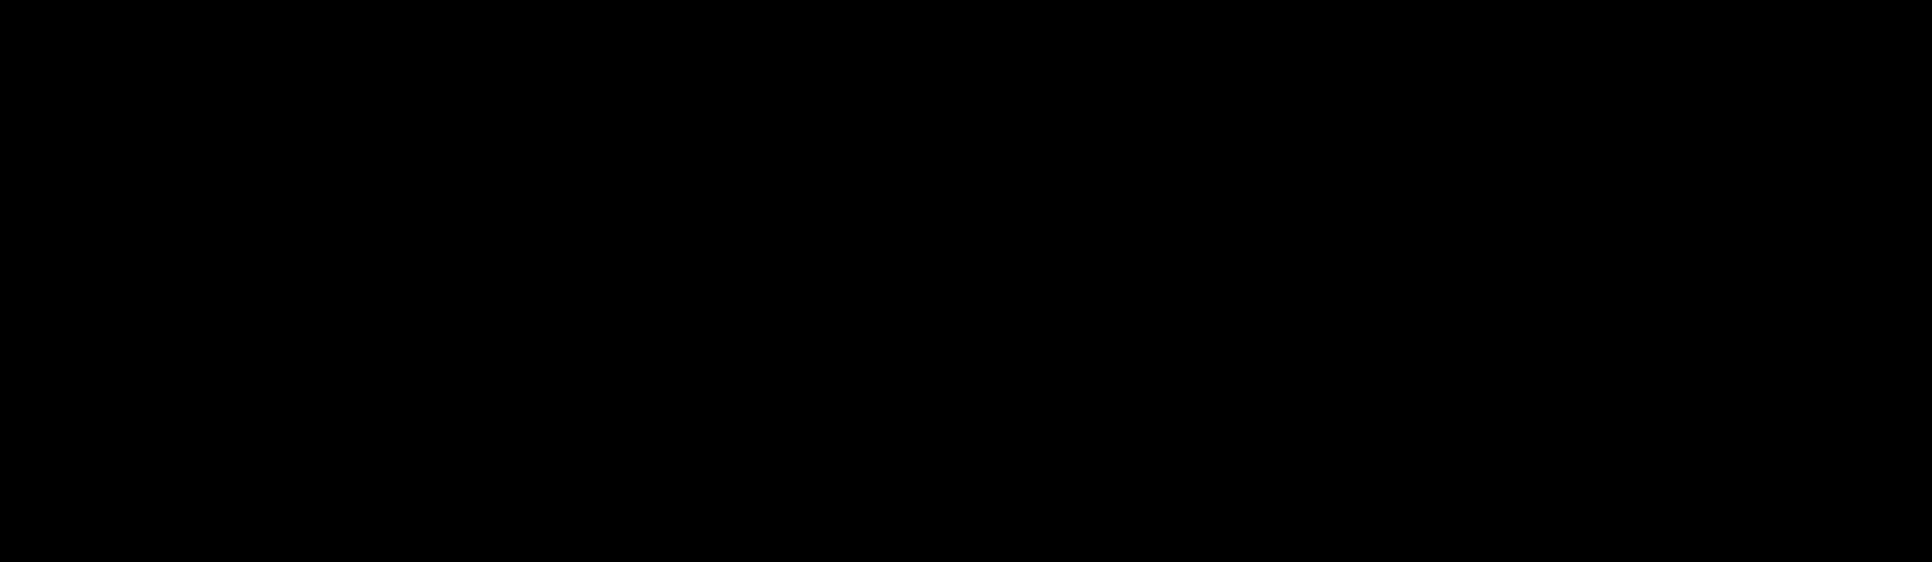 (S)-(+)-Ibuprofen acyl-β-D-glucuronide